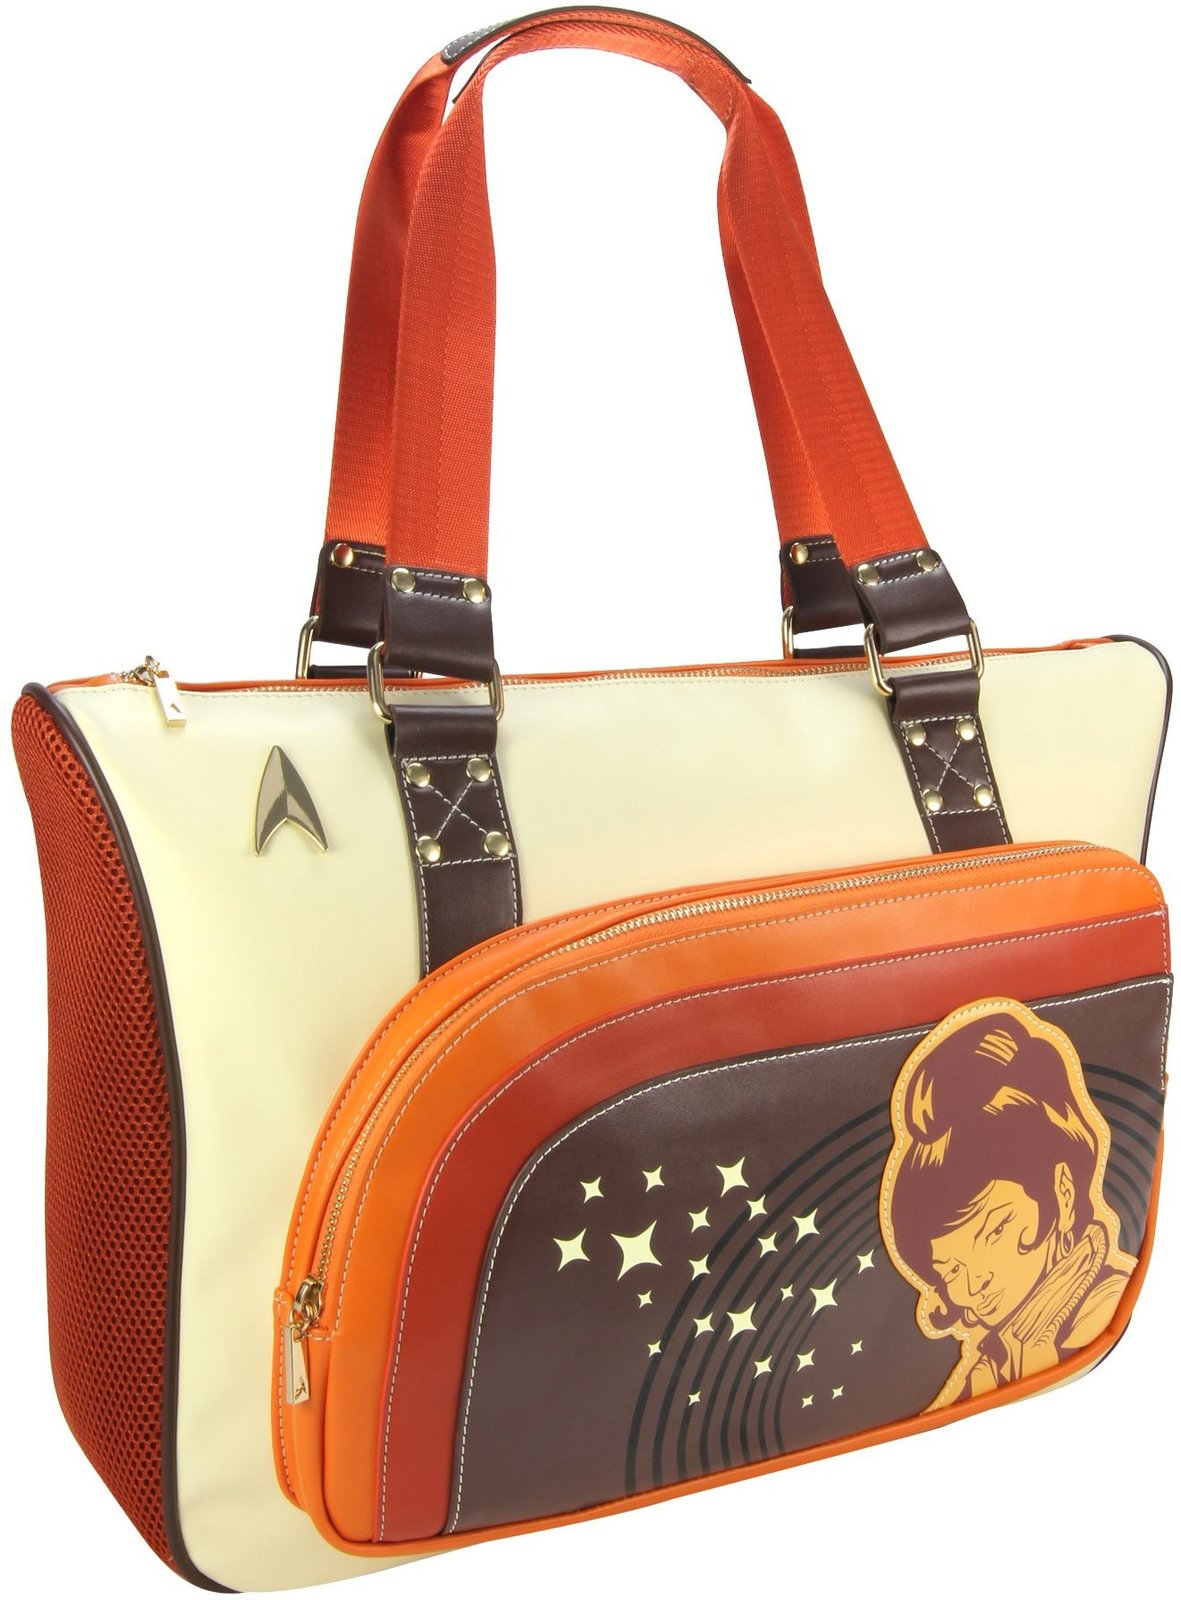 Star Trek Uhura Retro Space Tote image